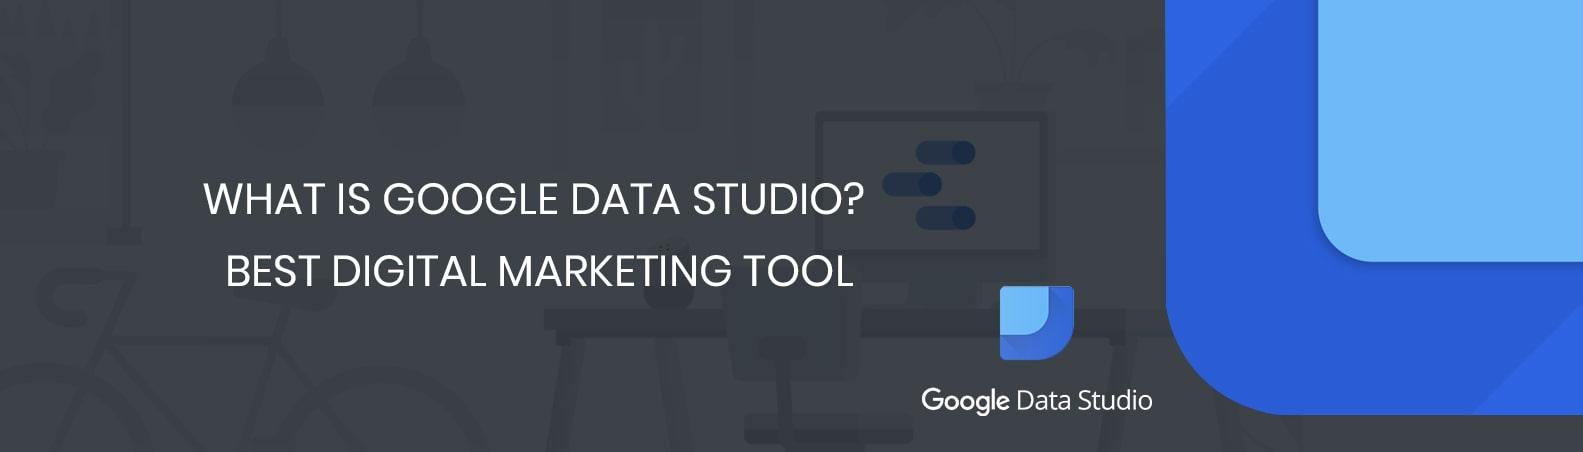 What is Google Data Studio? | Best Digital Marketing Tool